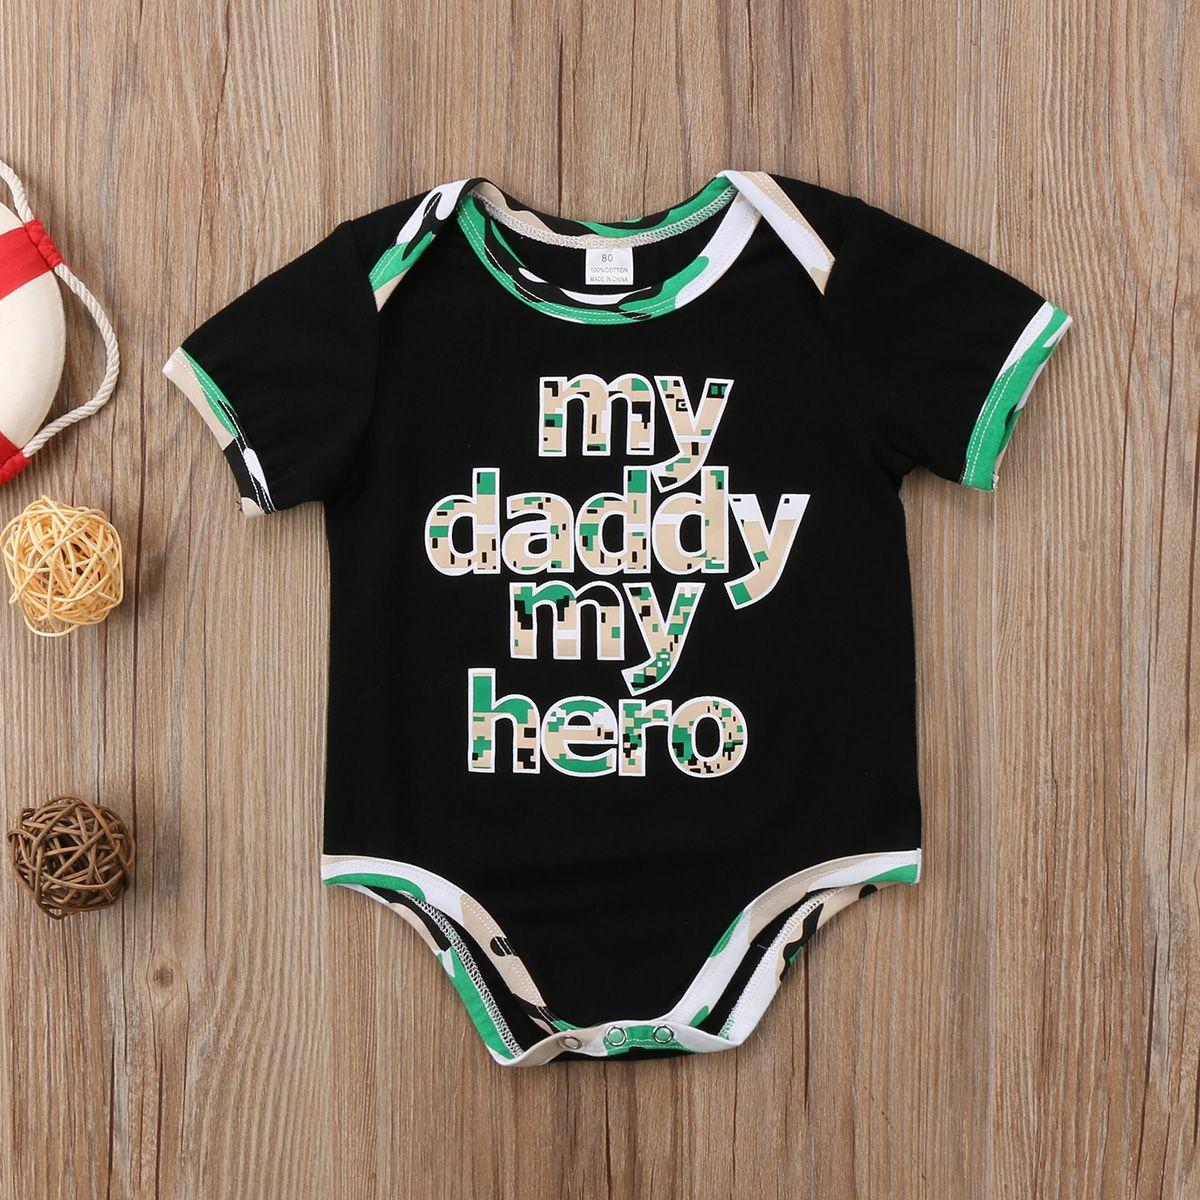 19e674d8f5ba 2019 Newborn Baby Boys Toddler Camo Romper Letter Print Jumpsuit ...